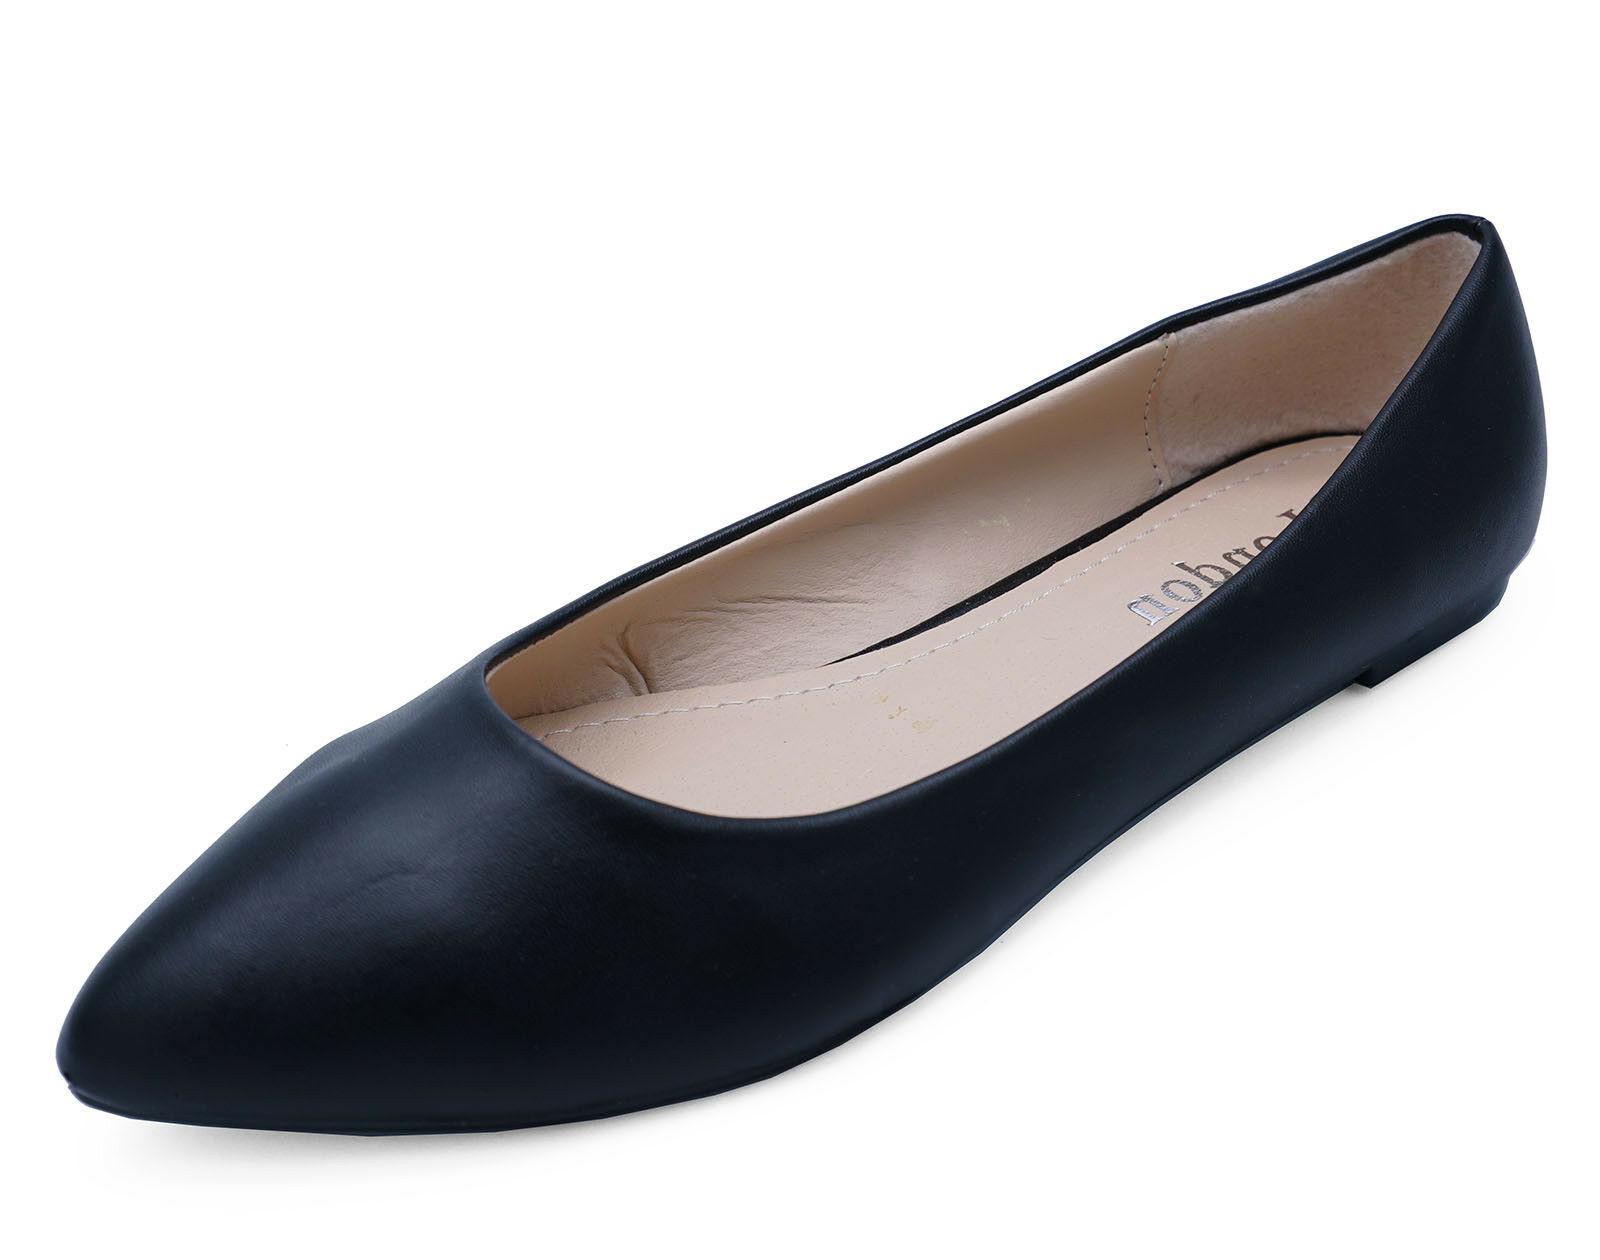 WOMENS BLACK SLIP-ON WORK FLAT SHOES